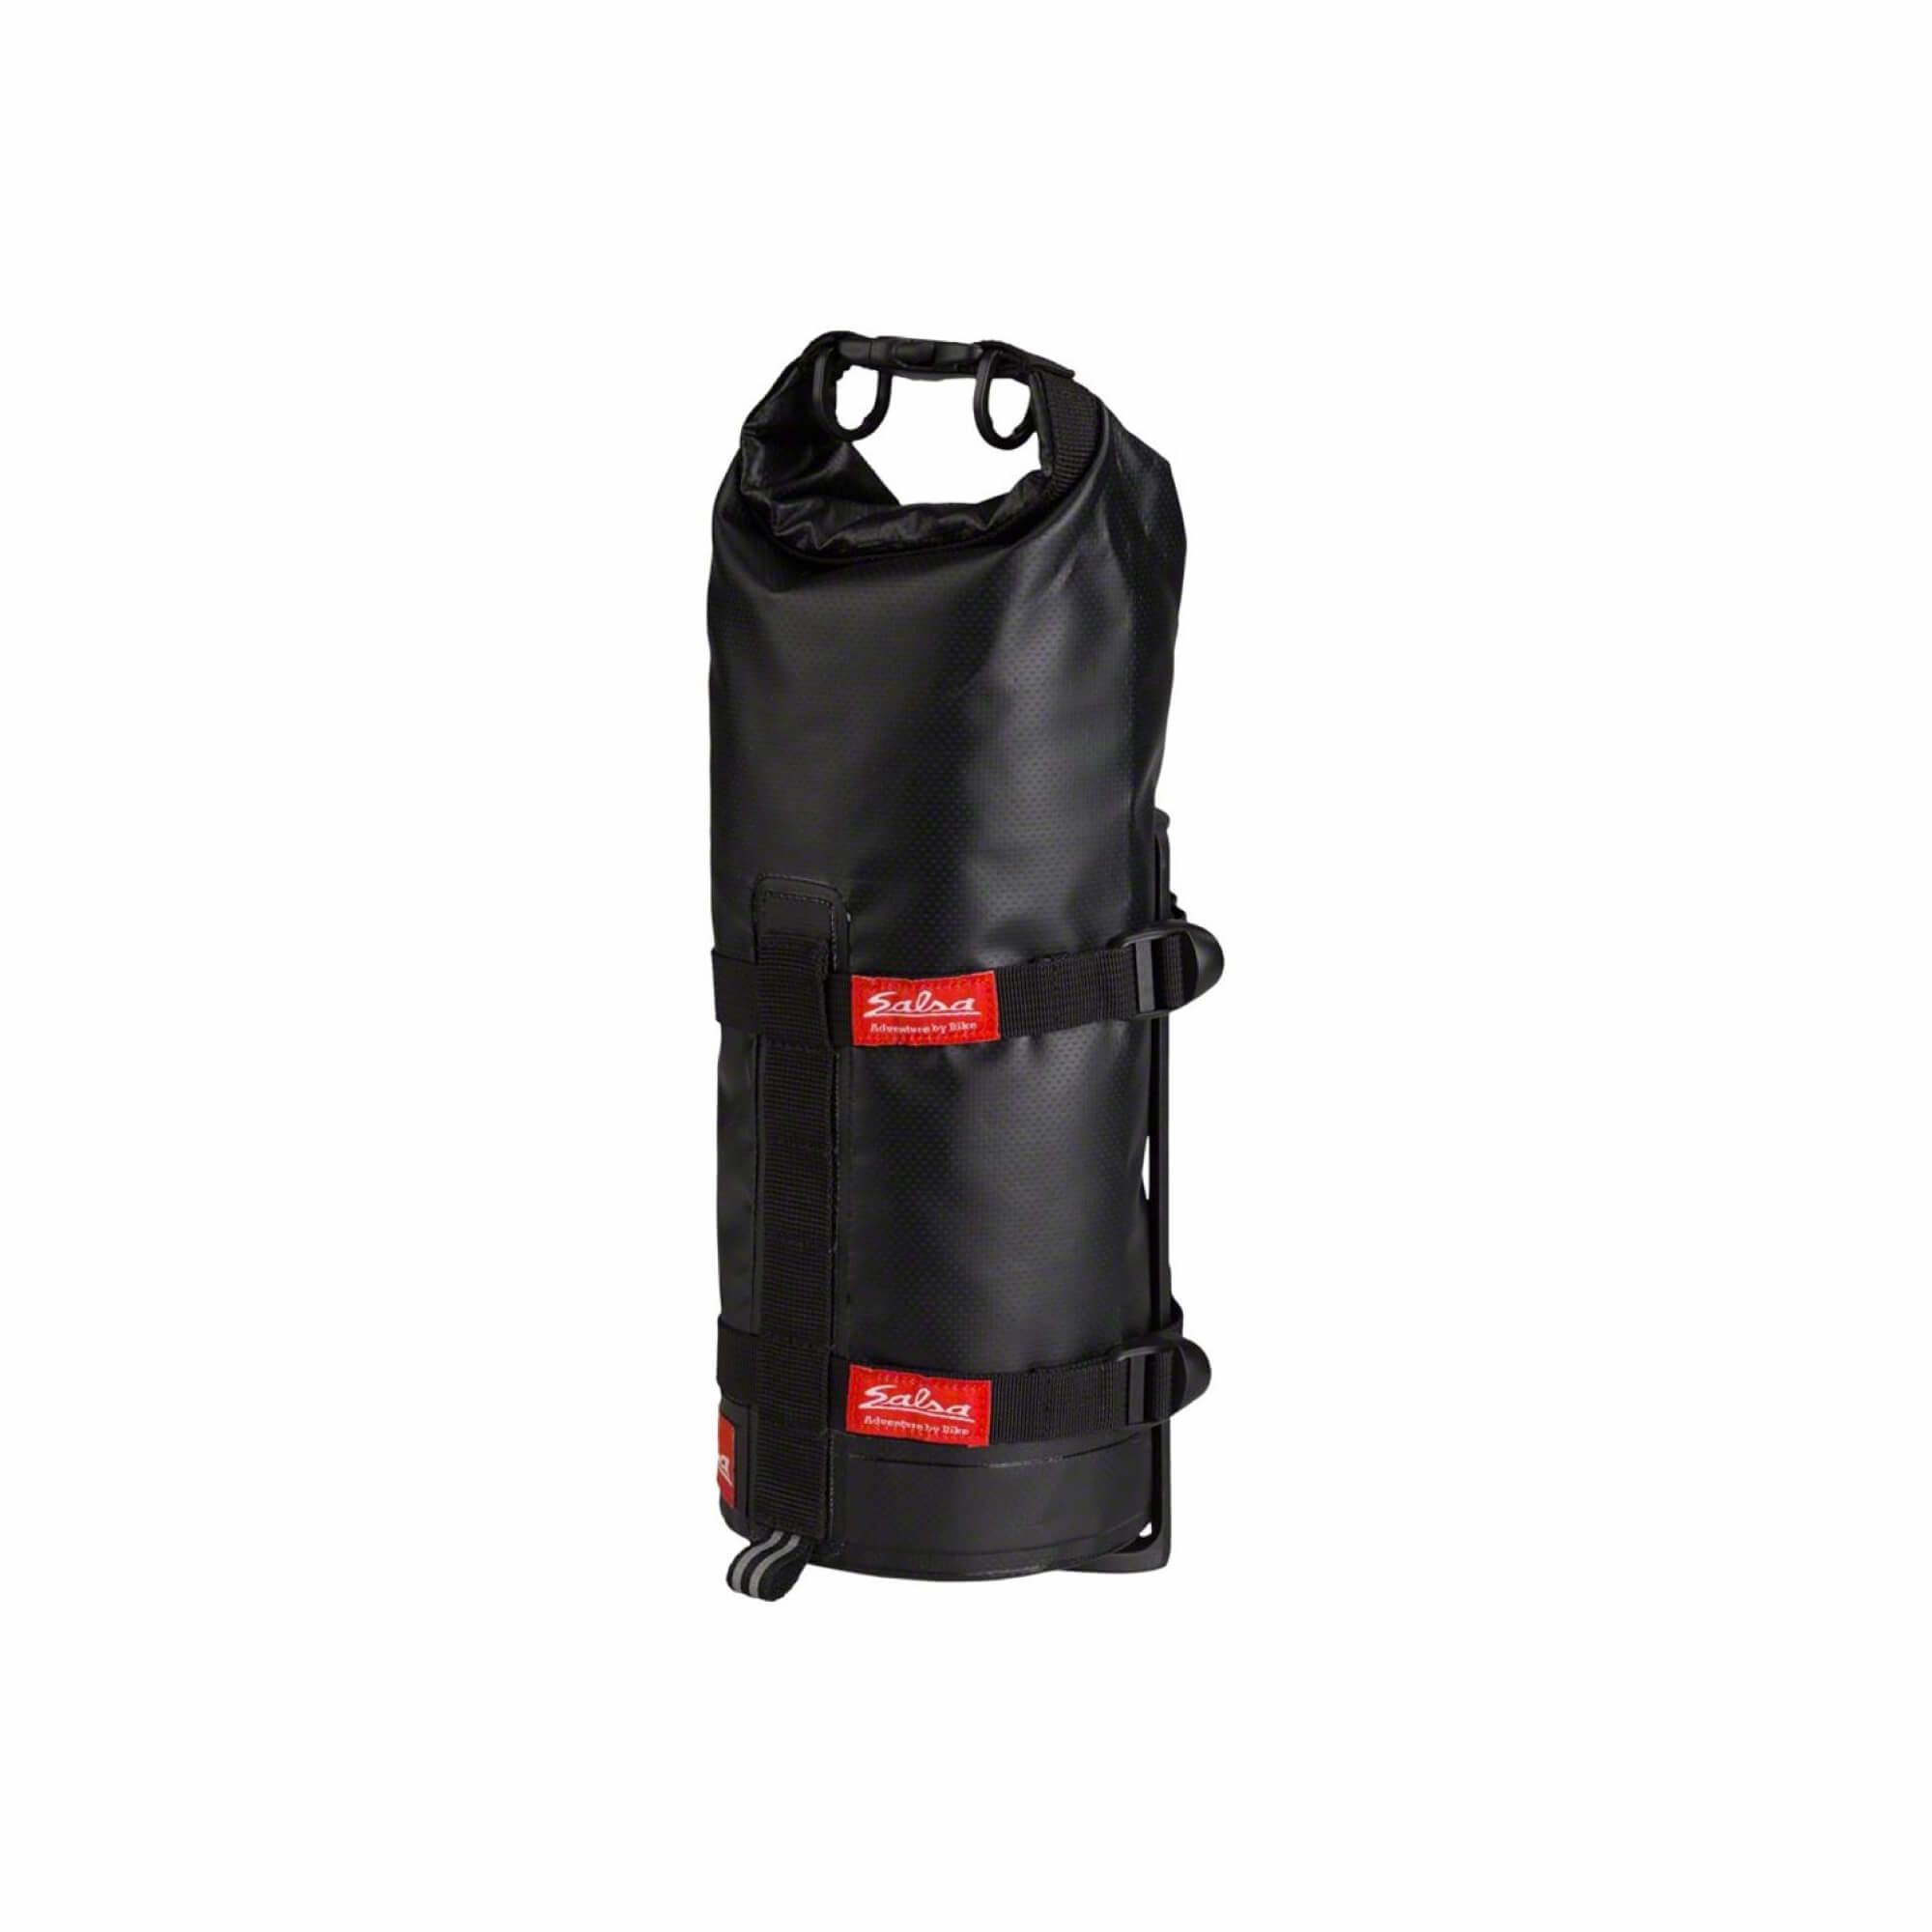 Anything Cage Bag Black Colour: Black-2